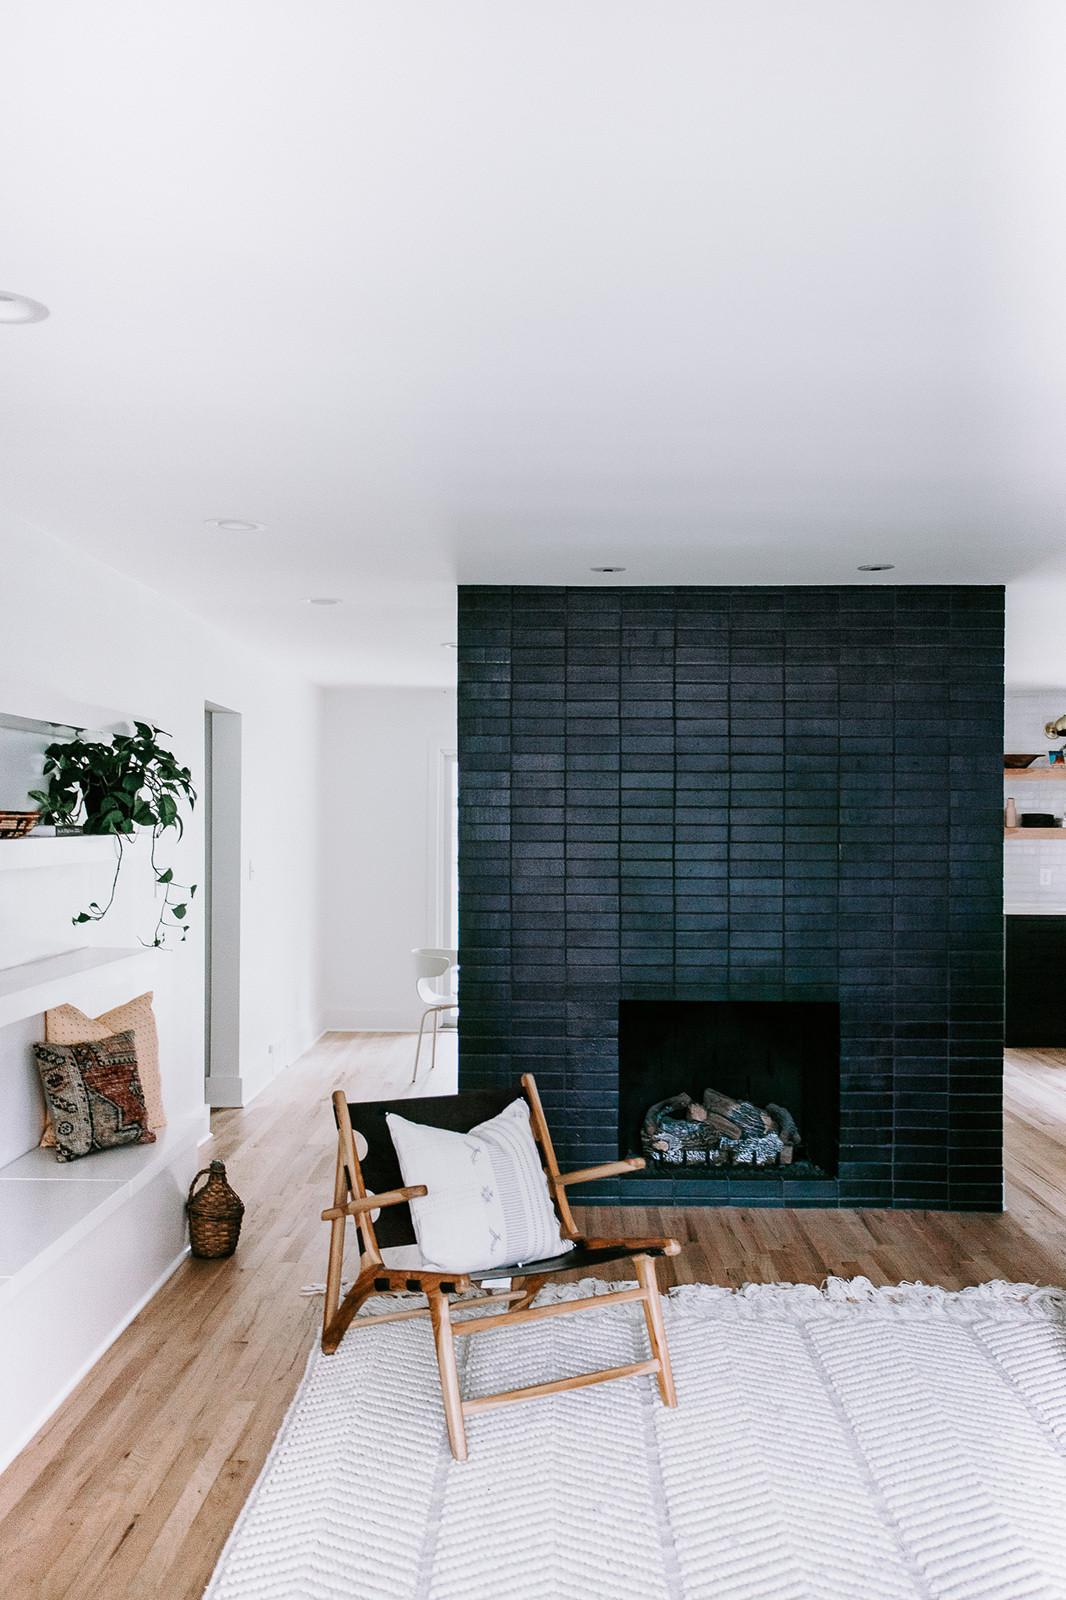 Fireplace surround in Glazed Thin Brick in Black Hills